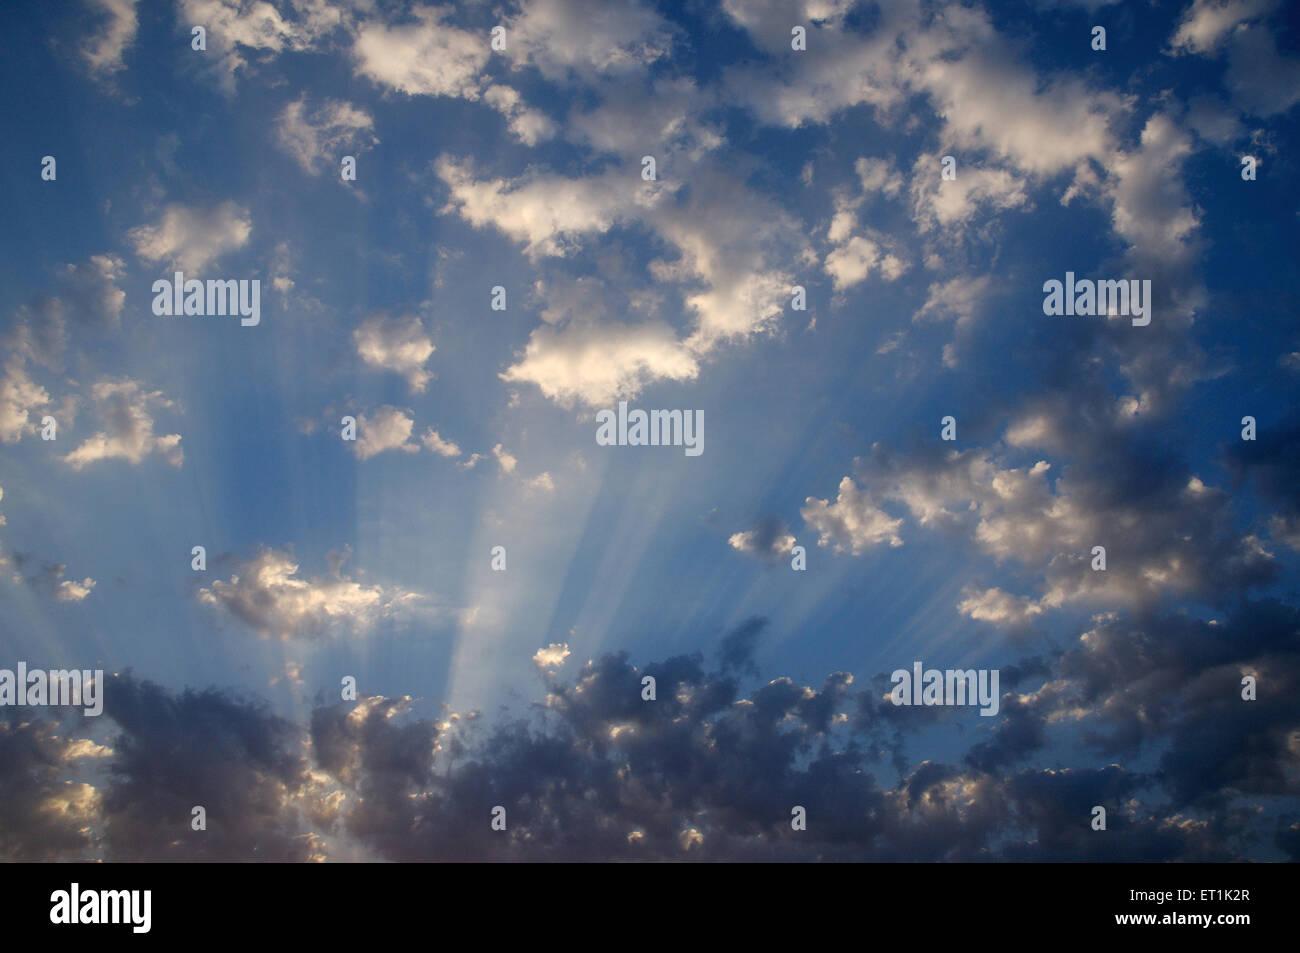 Natural phenomenon of cloud formation and sunrays ; Pune ; Maharashtra ; India 19th April 2010 - Stock Image